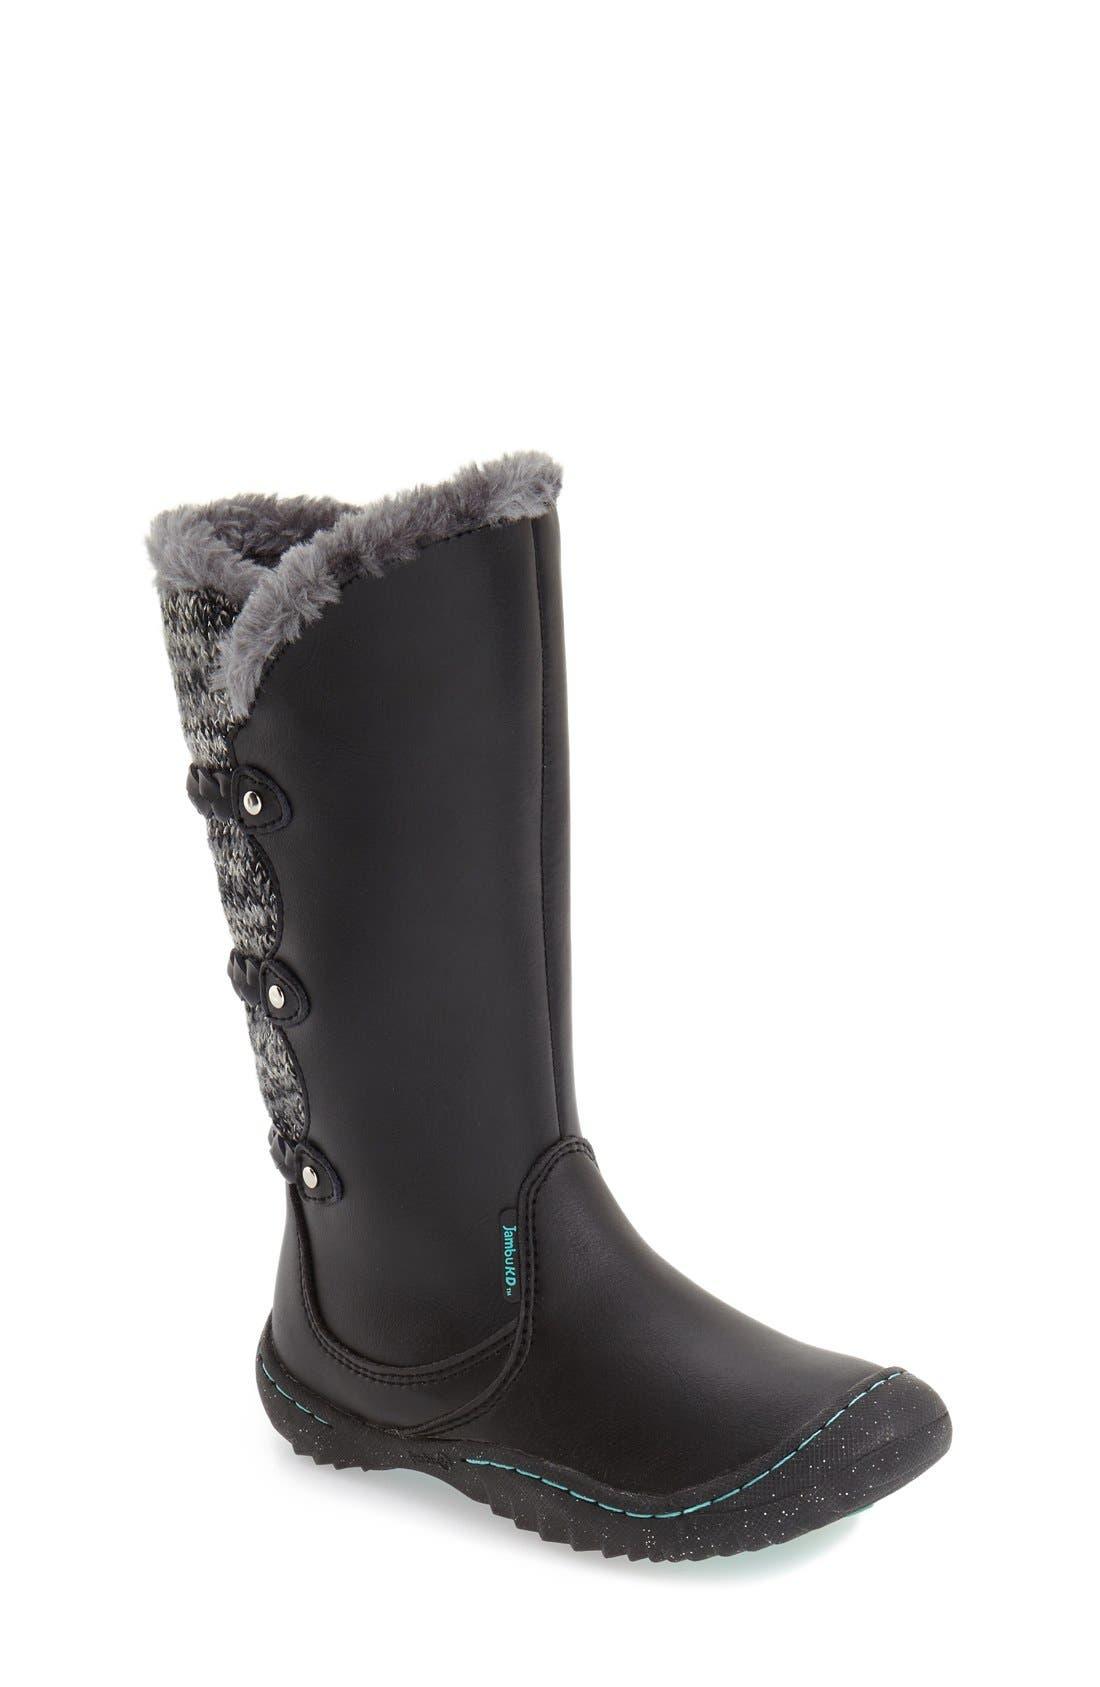 'Azami' Water Resistant Boot,                             Main thumbnail 1, color,                             001